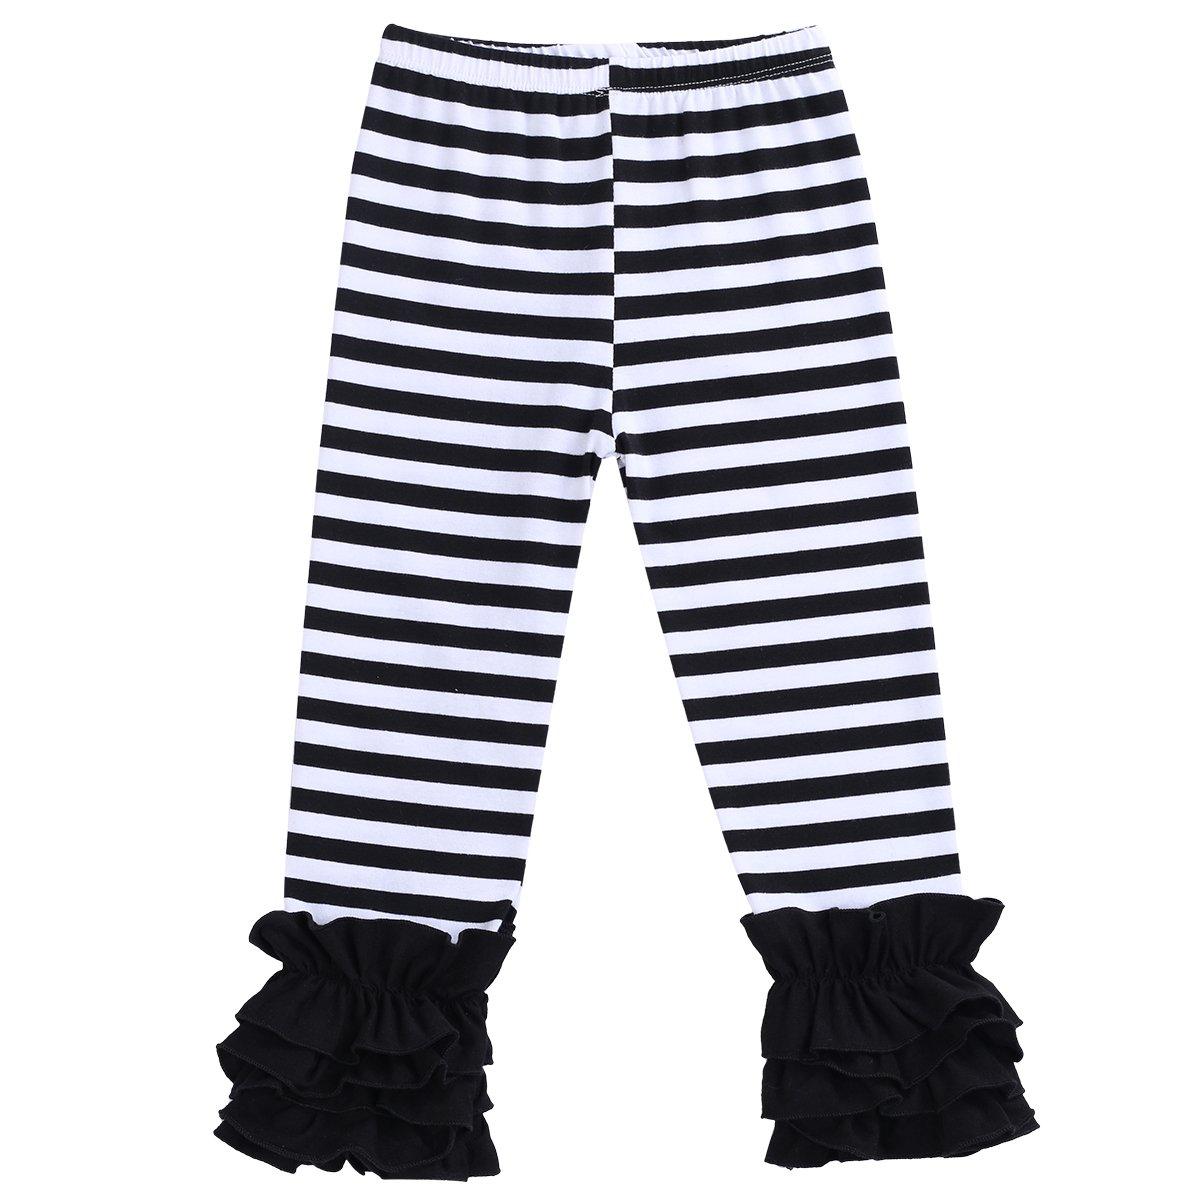 Little Girl's Double Icing Ruffle Leggings Triple Cotton Boutique Elastic Waist Slacks Joggers Activewear